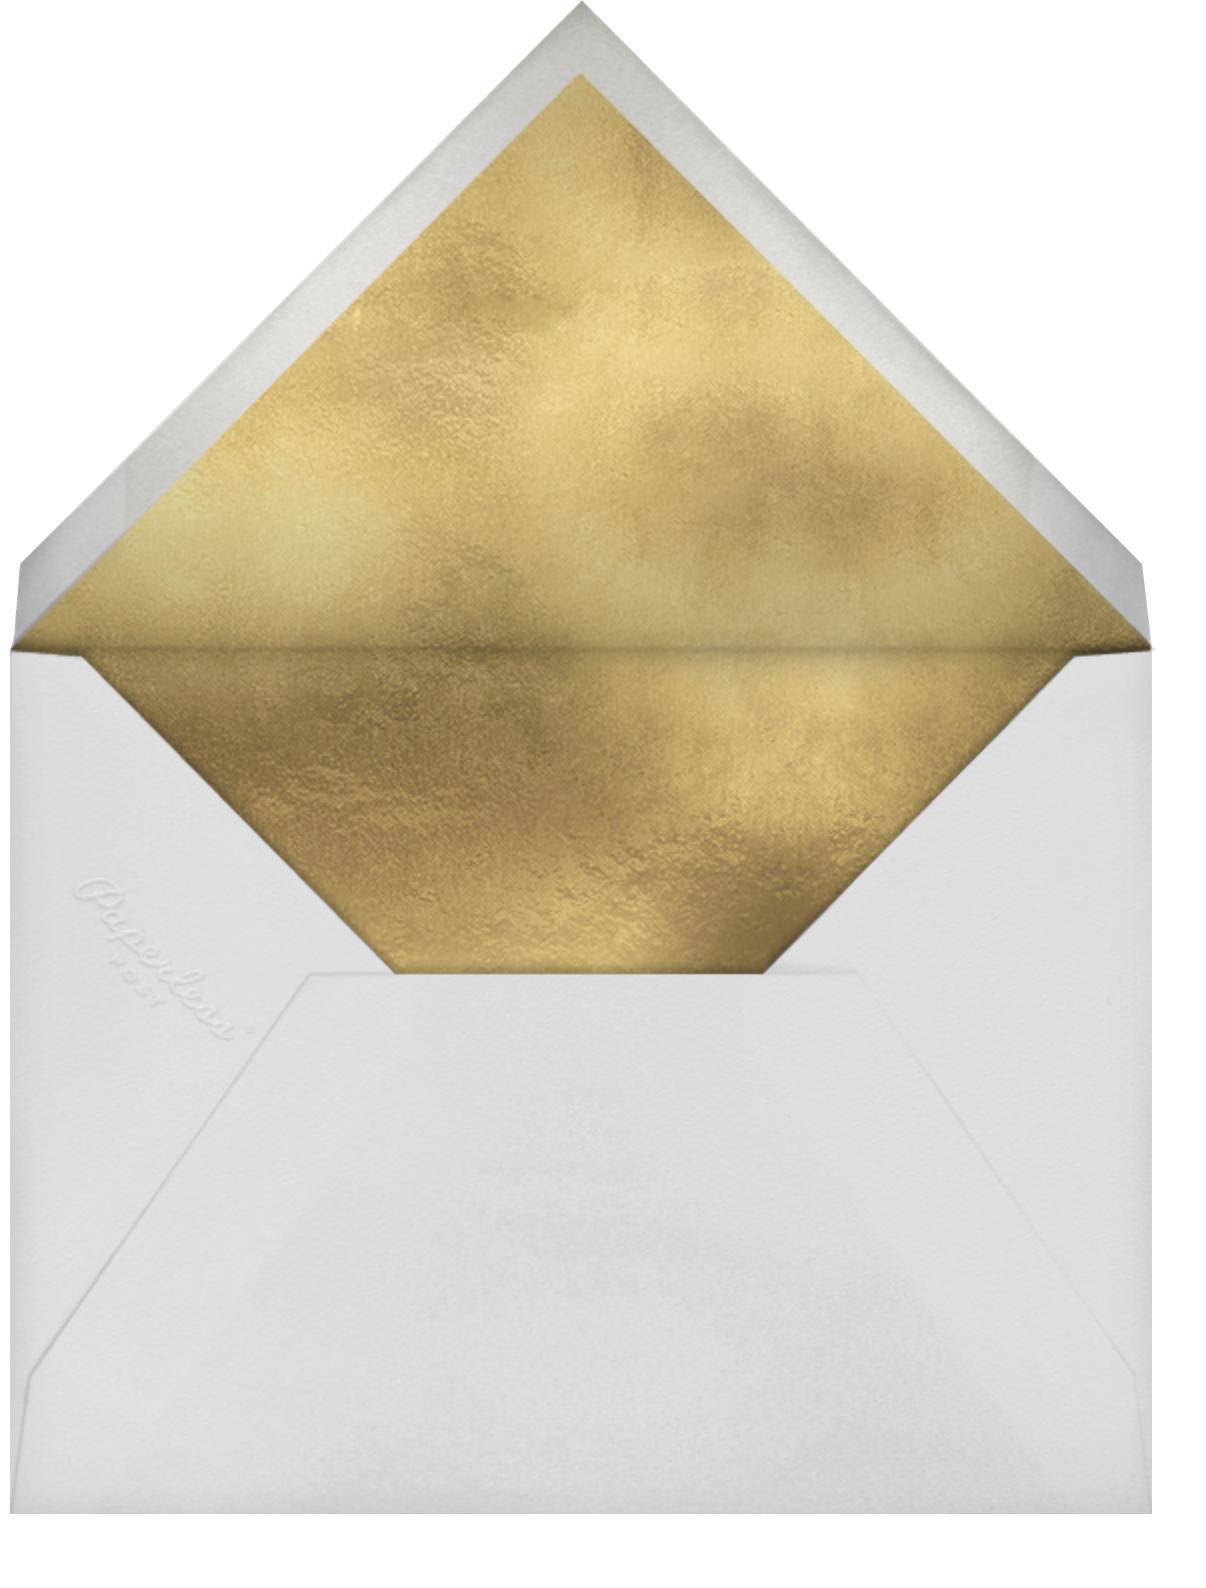 Stamped Greenery - Navy - Oscar de la Renta - Adult birthday - envelope back